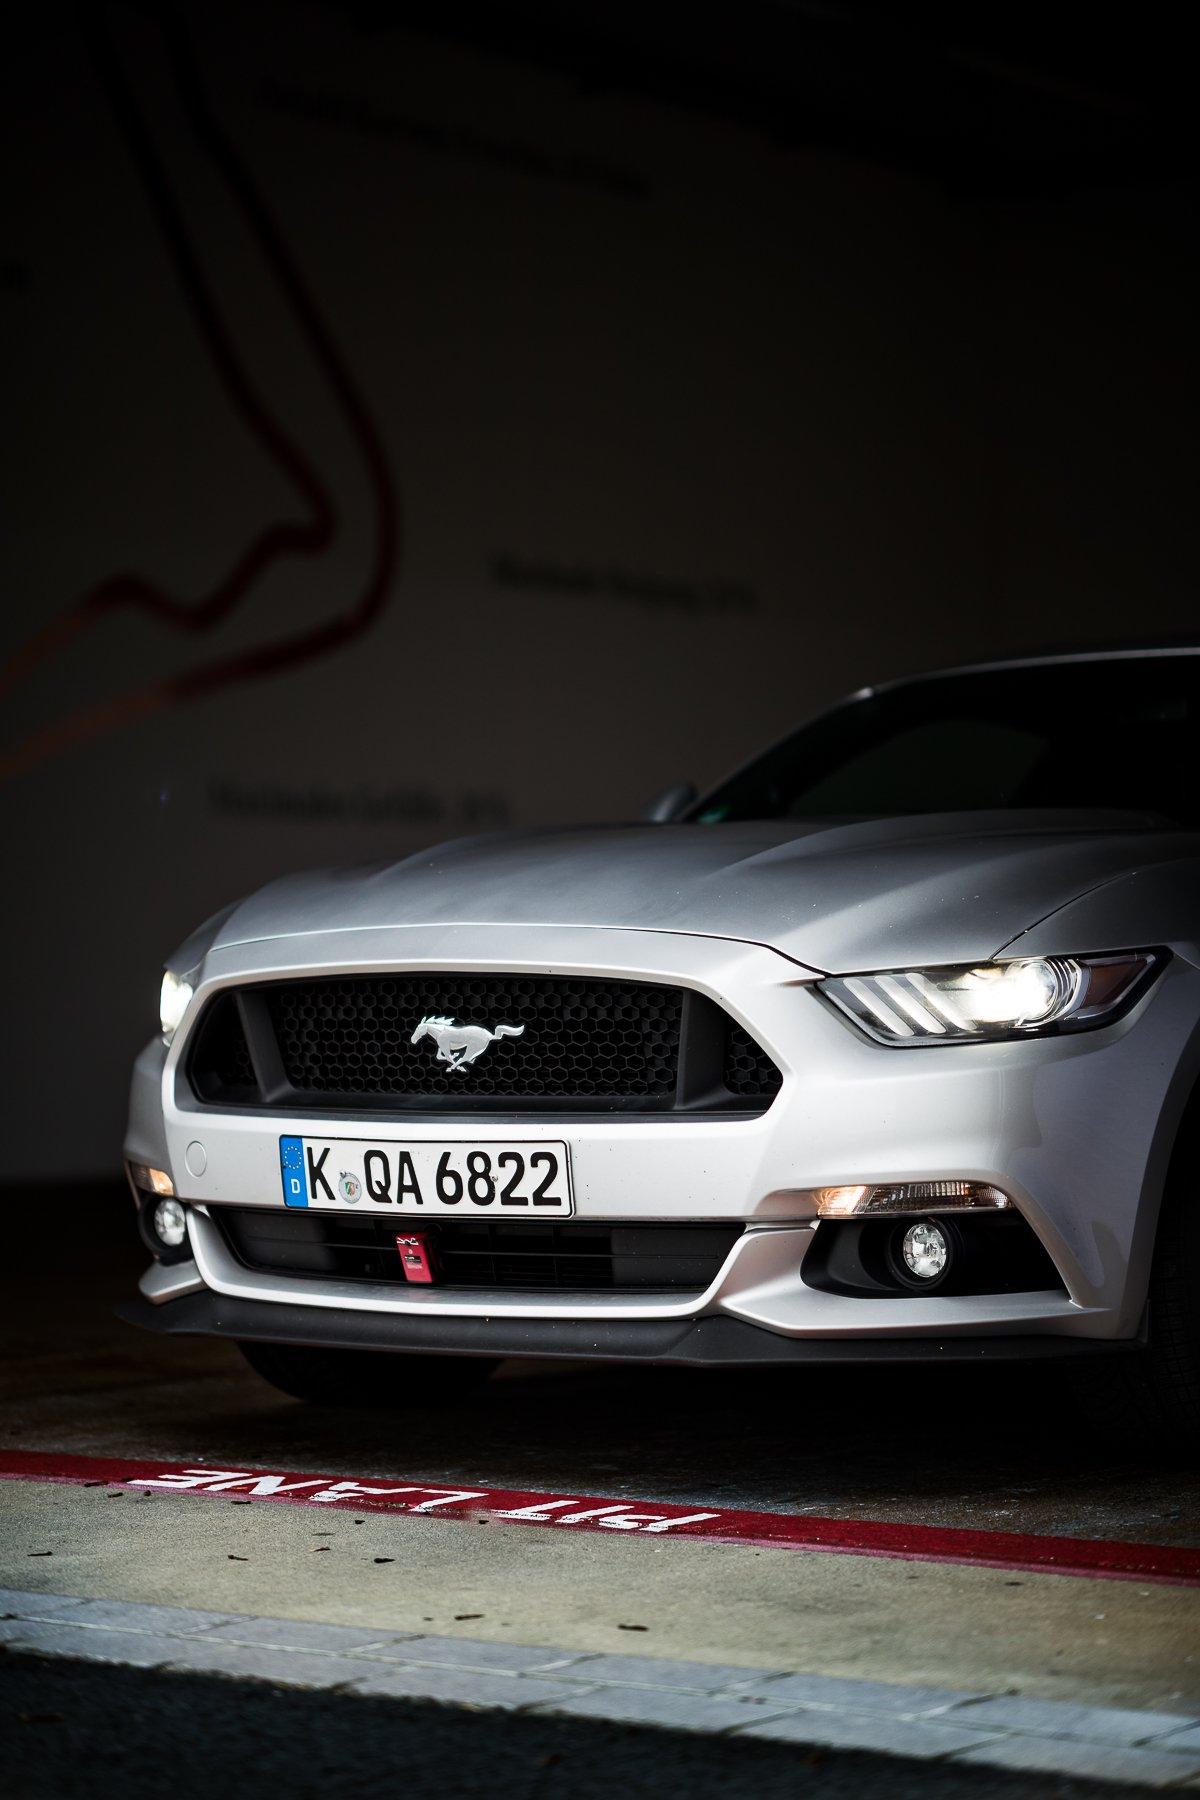 Ford Mustang GT 5.0 421 PS Bilster Berg Rennstrecke Racetrack Silber V8 Kühlergrill Aerodynamik Boxengasse Pit Lane Halle Schatten GPS Sensor